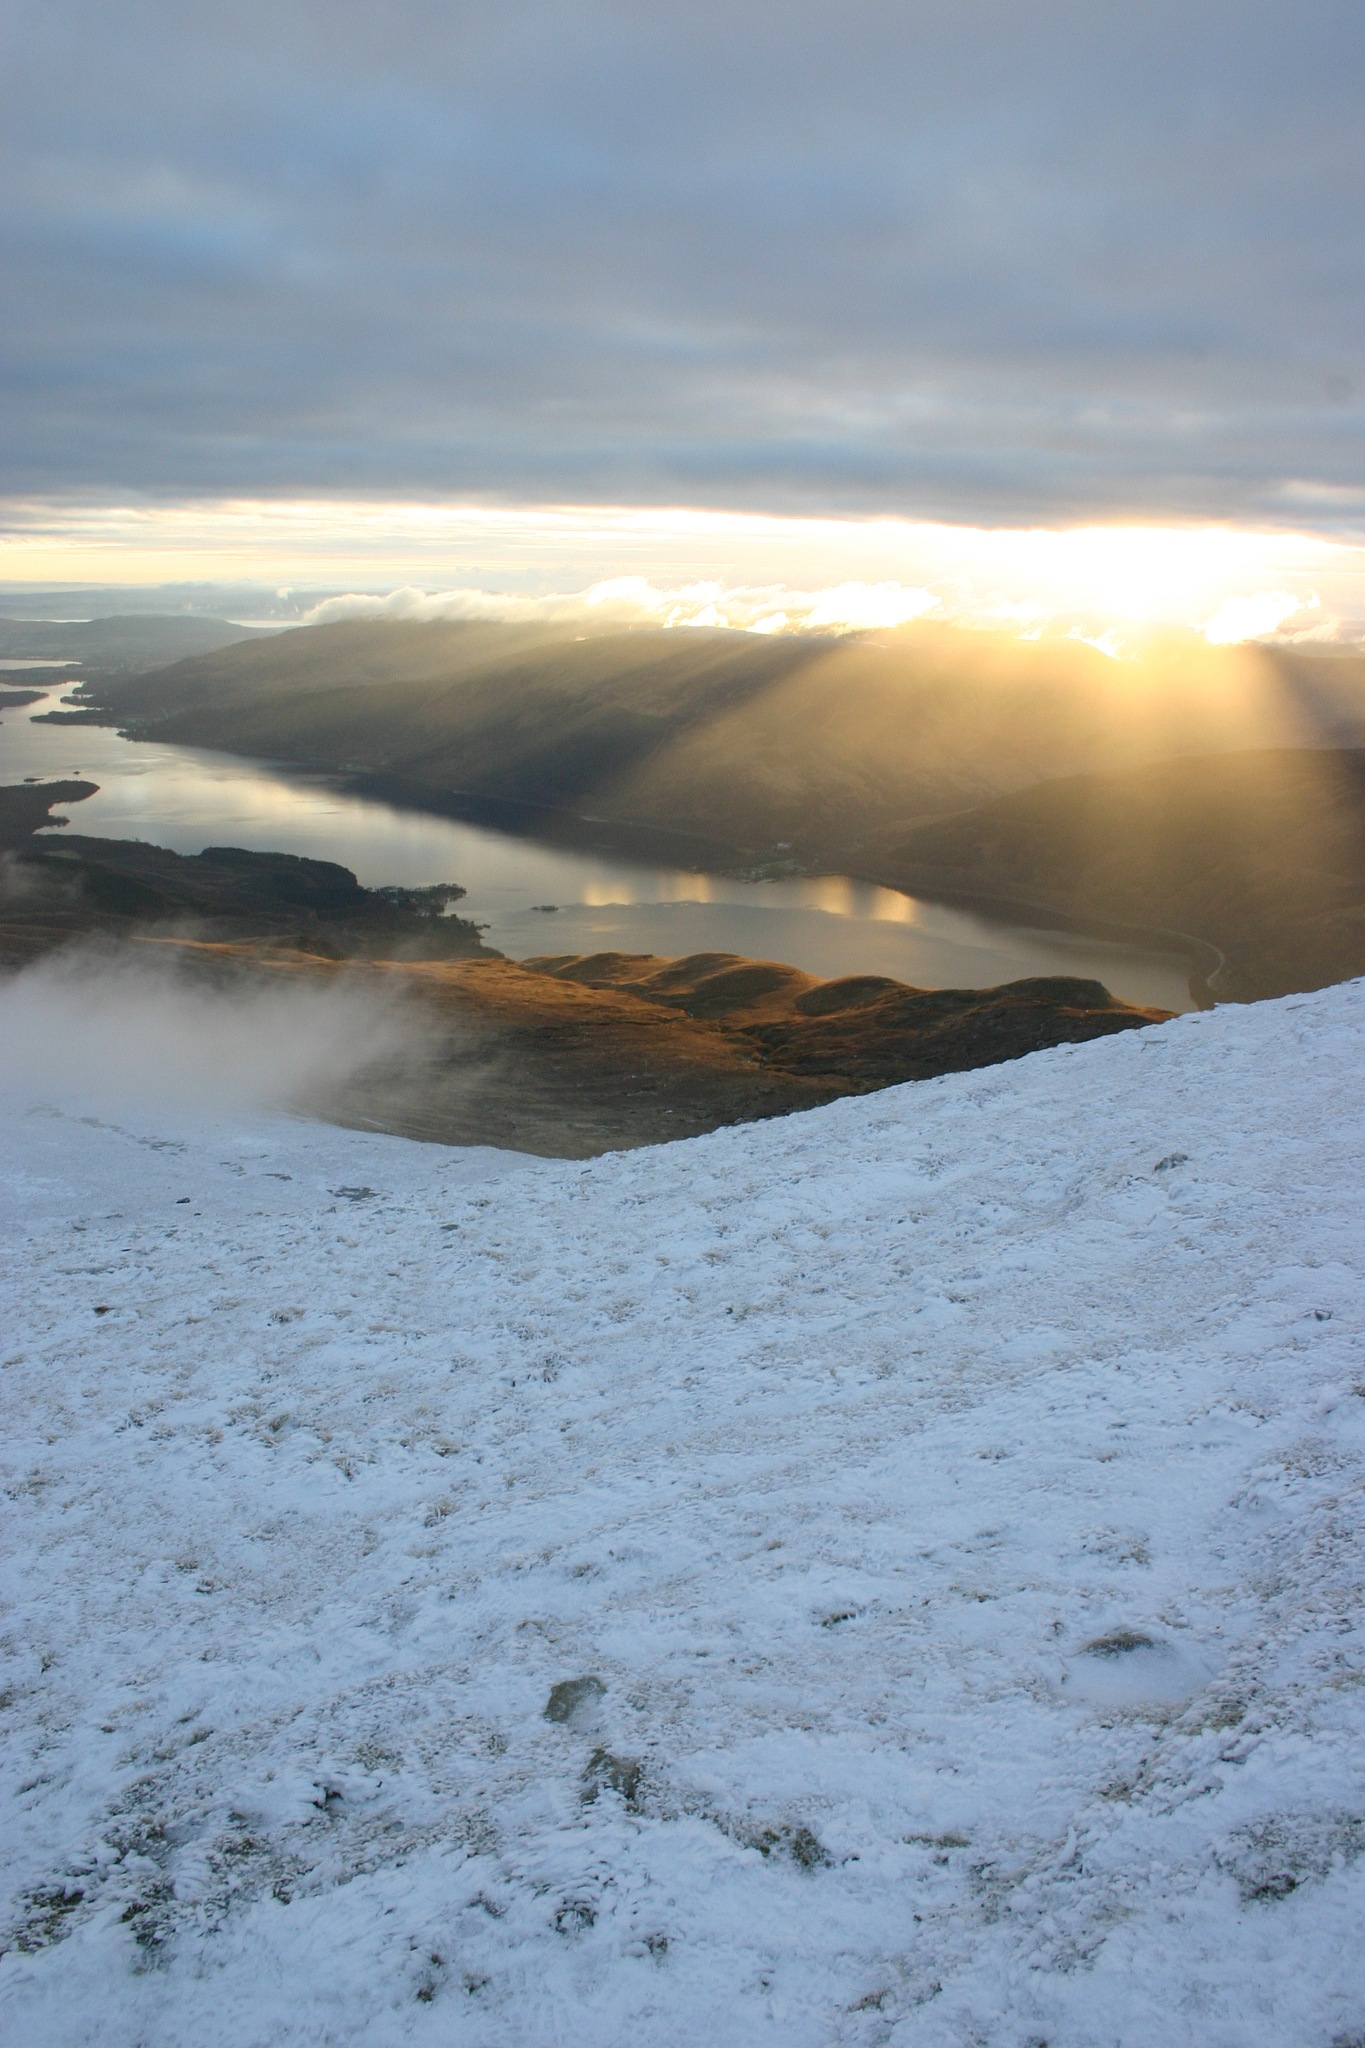 The Sun Sets on Loch Lomond by Fraser McCulloch